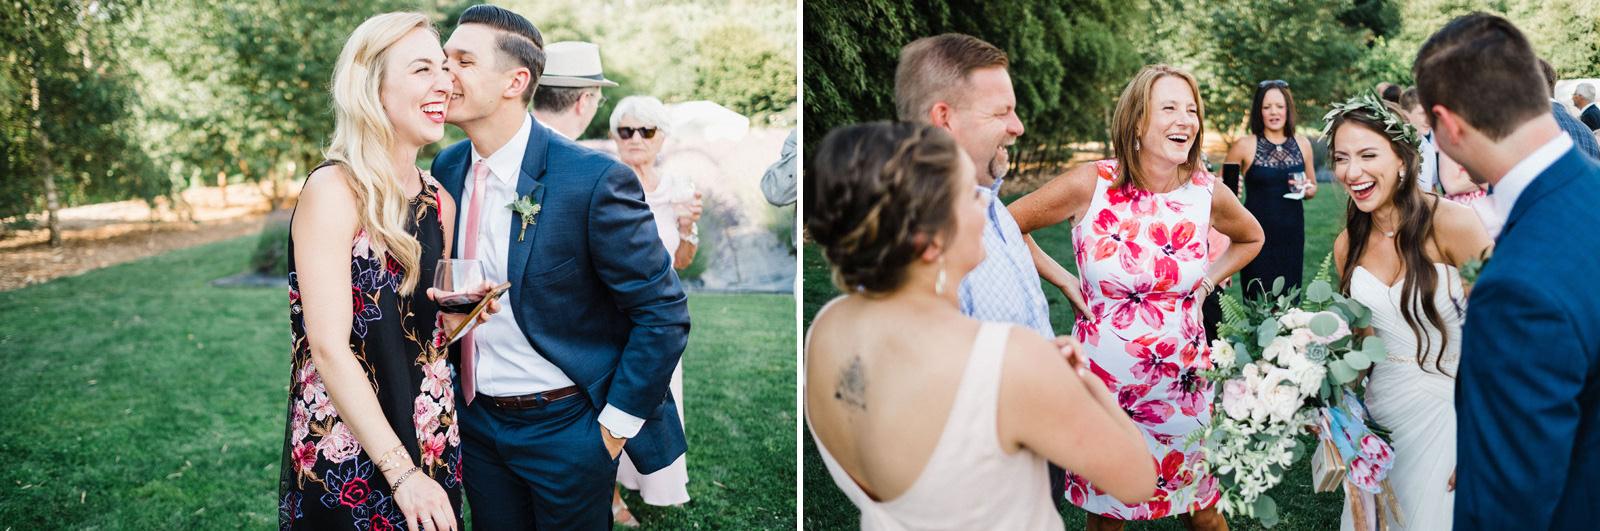 056-woodinville-lavendar-farm-wedding-with-golden-glowy-photos.jpg